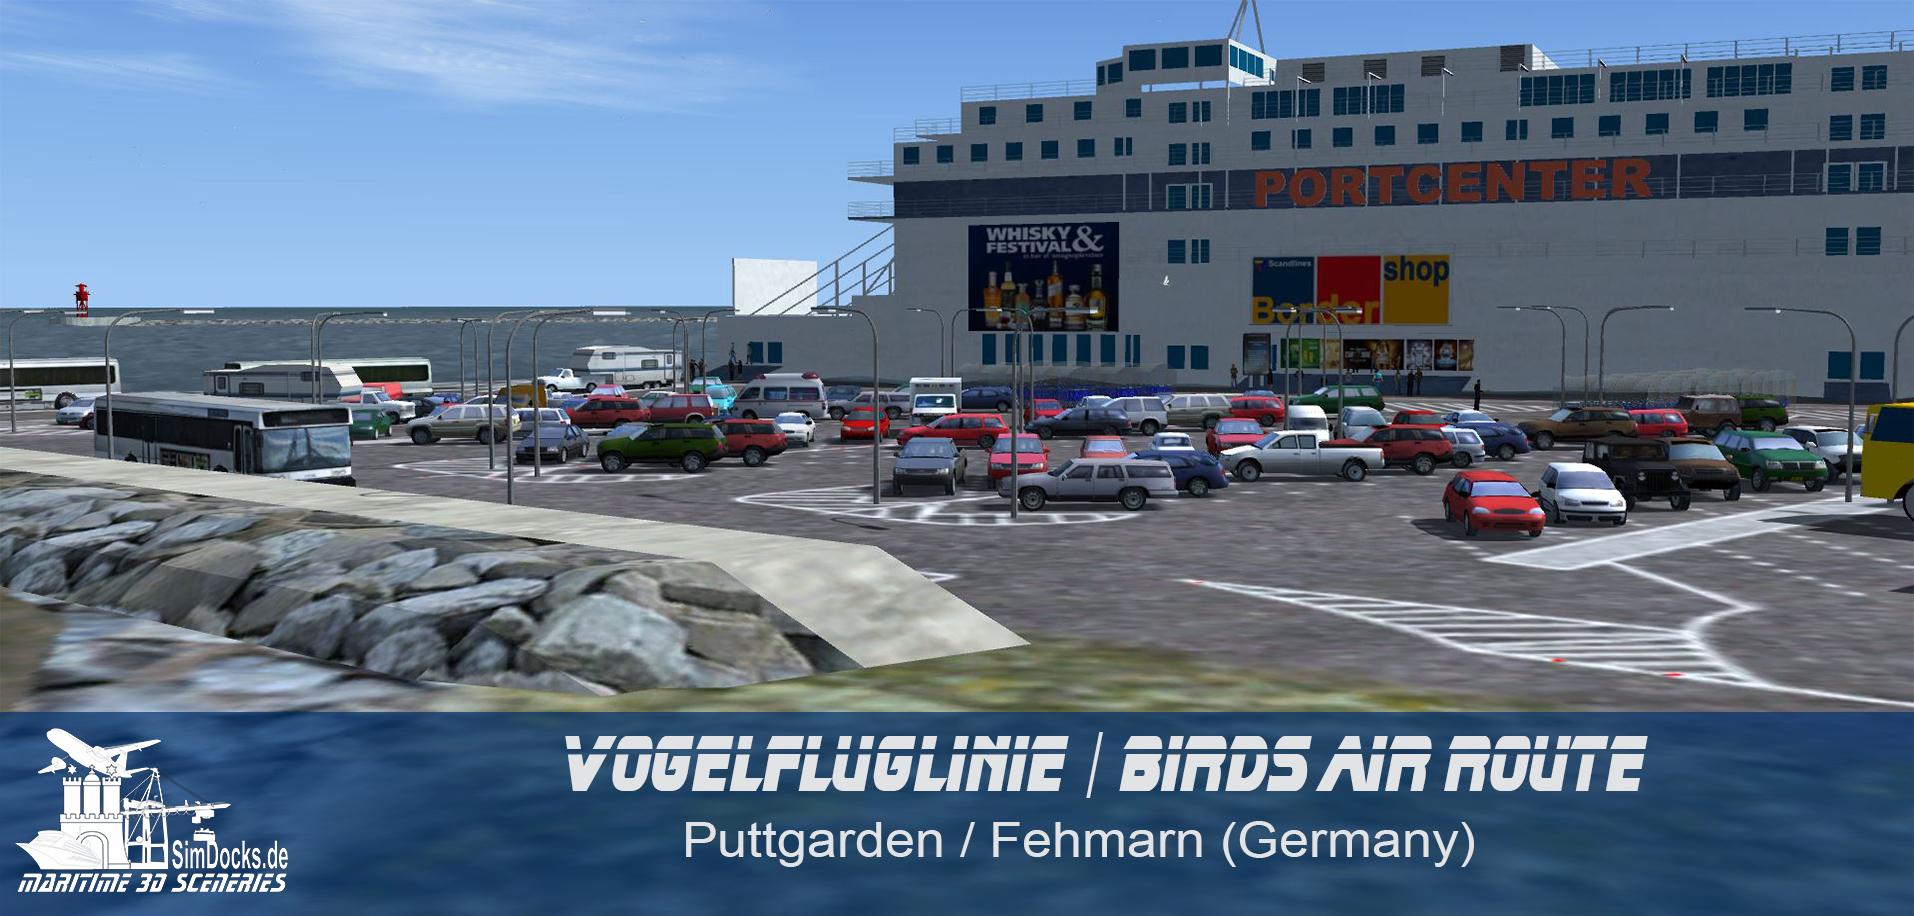 Puttgarden_Portcenter1.JPG